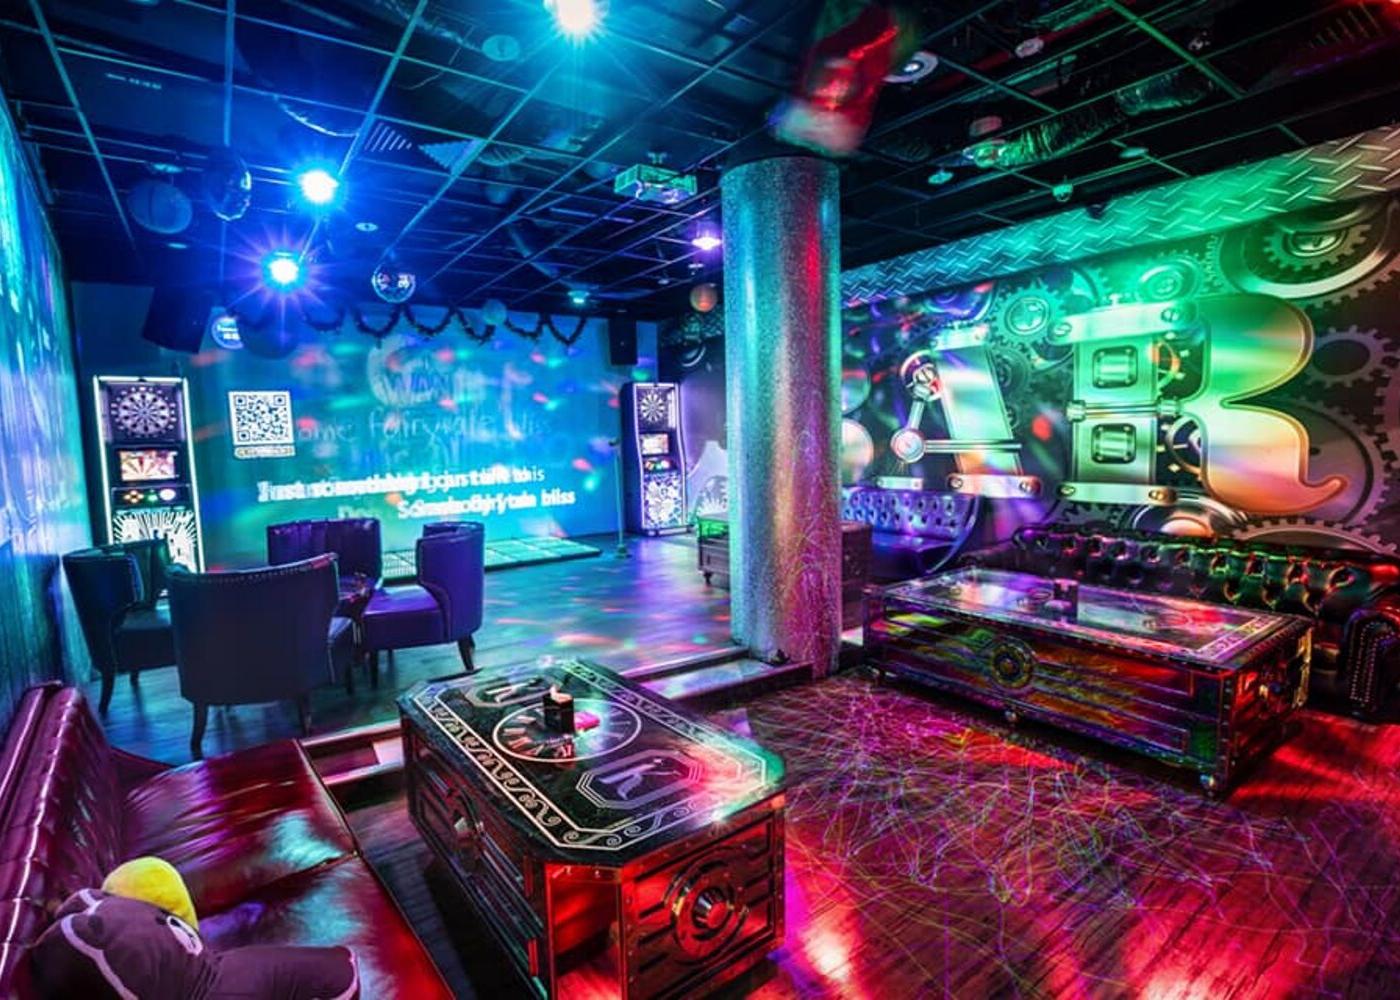 K. Star | Karaoke Studio Singapore